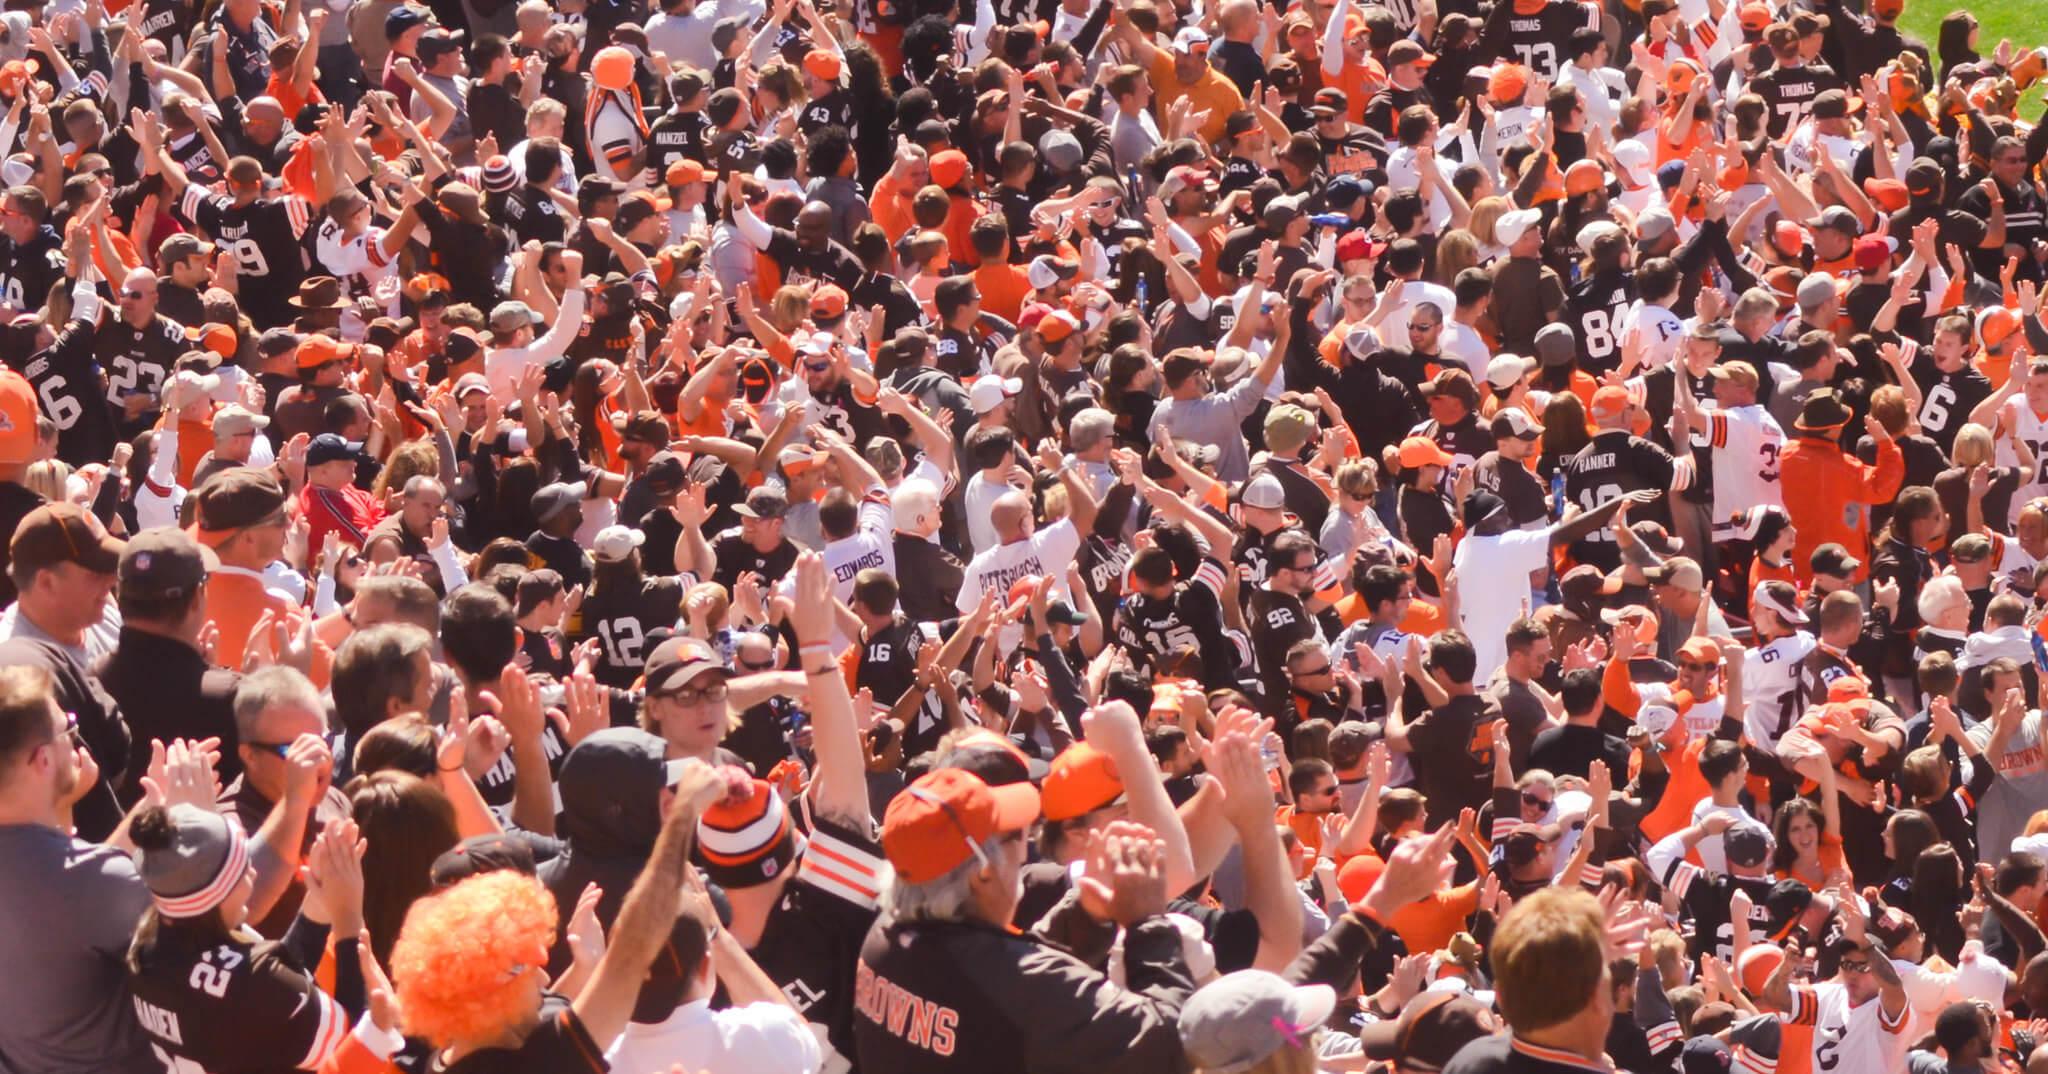 Cleveland Browns fansz